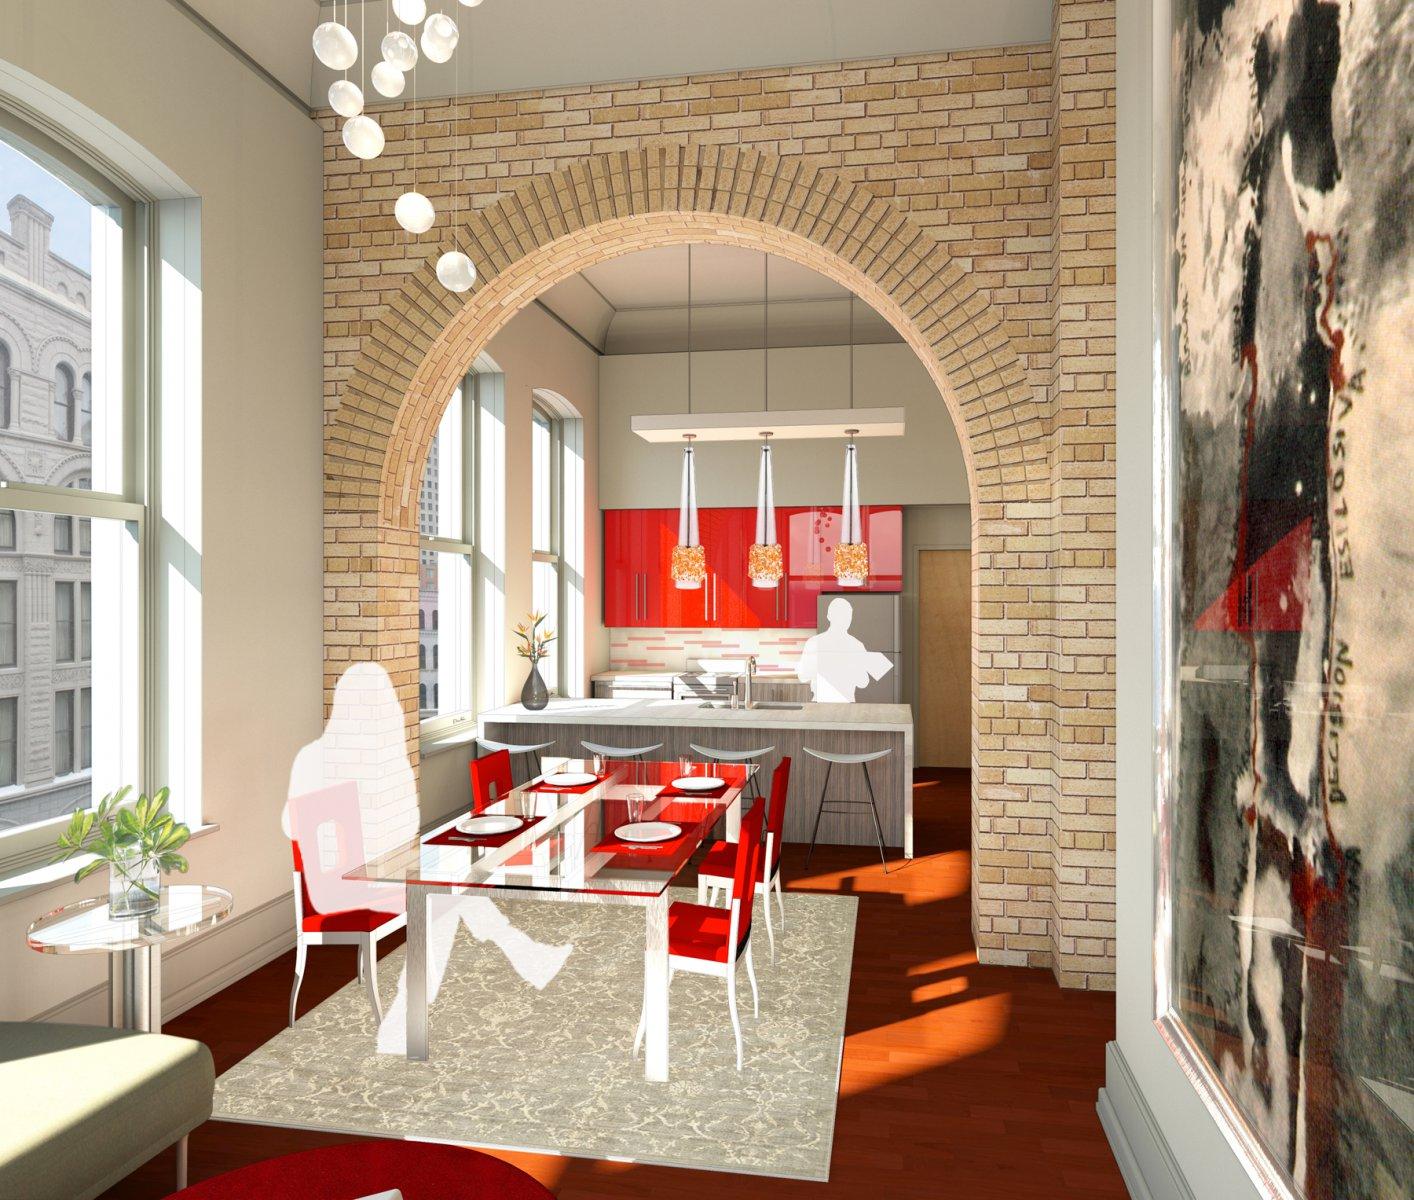 Mackie Building Kitchen Rendering